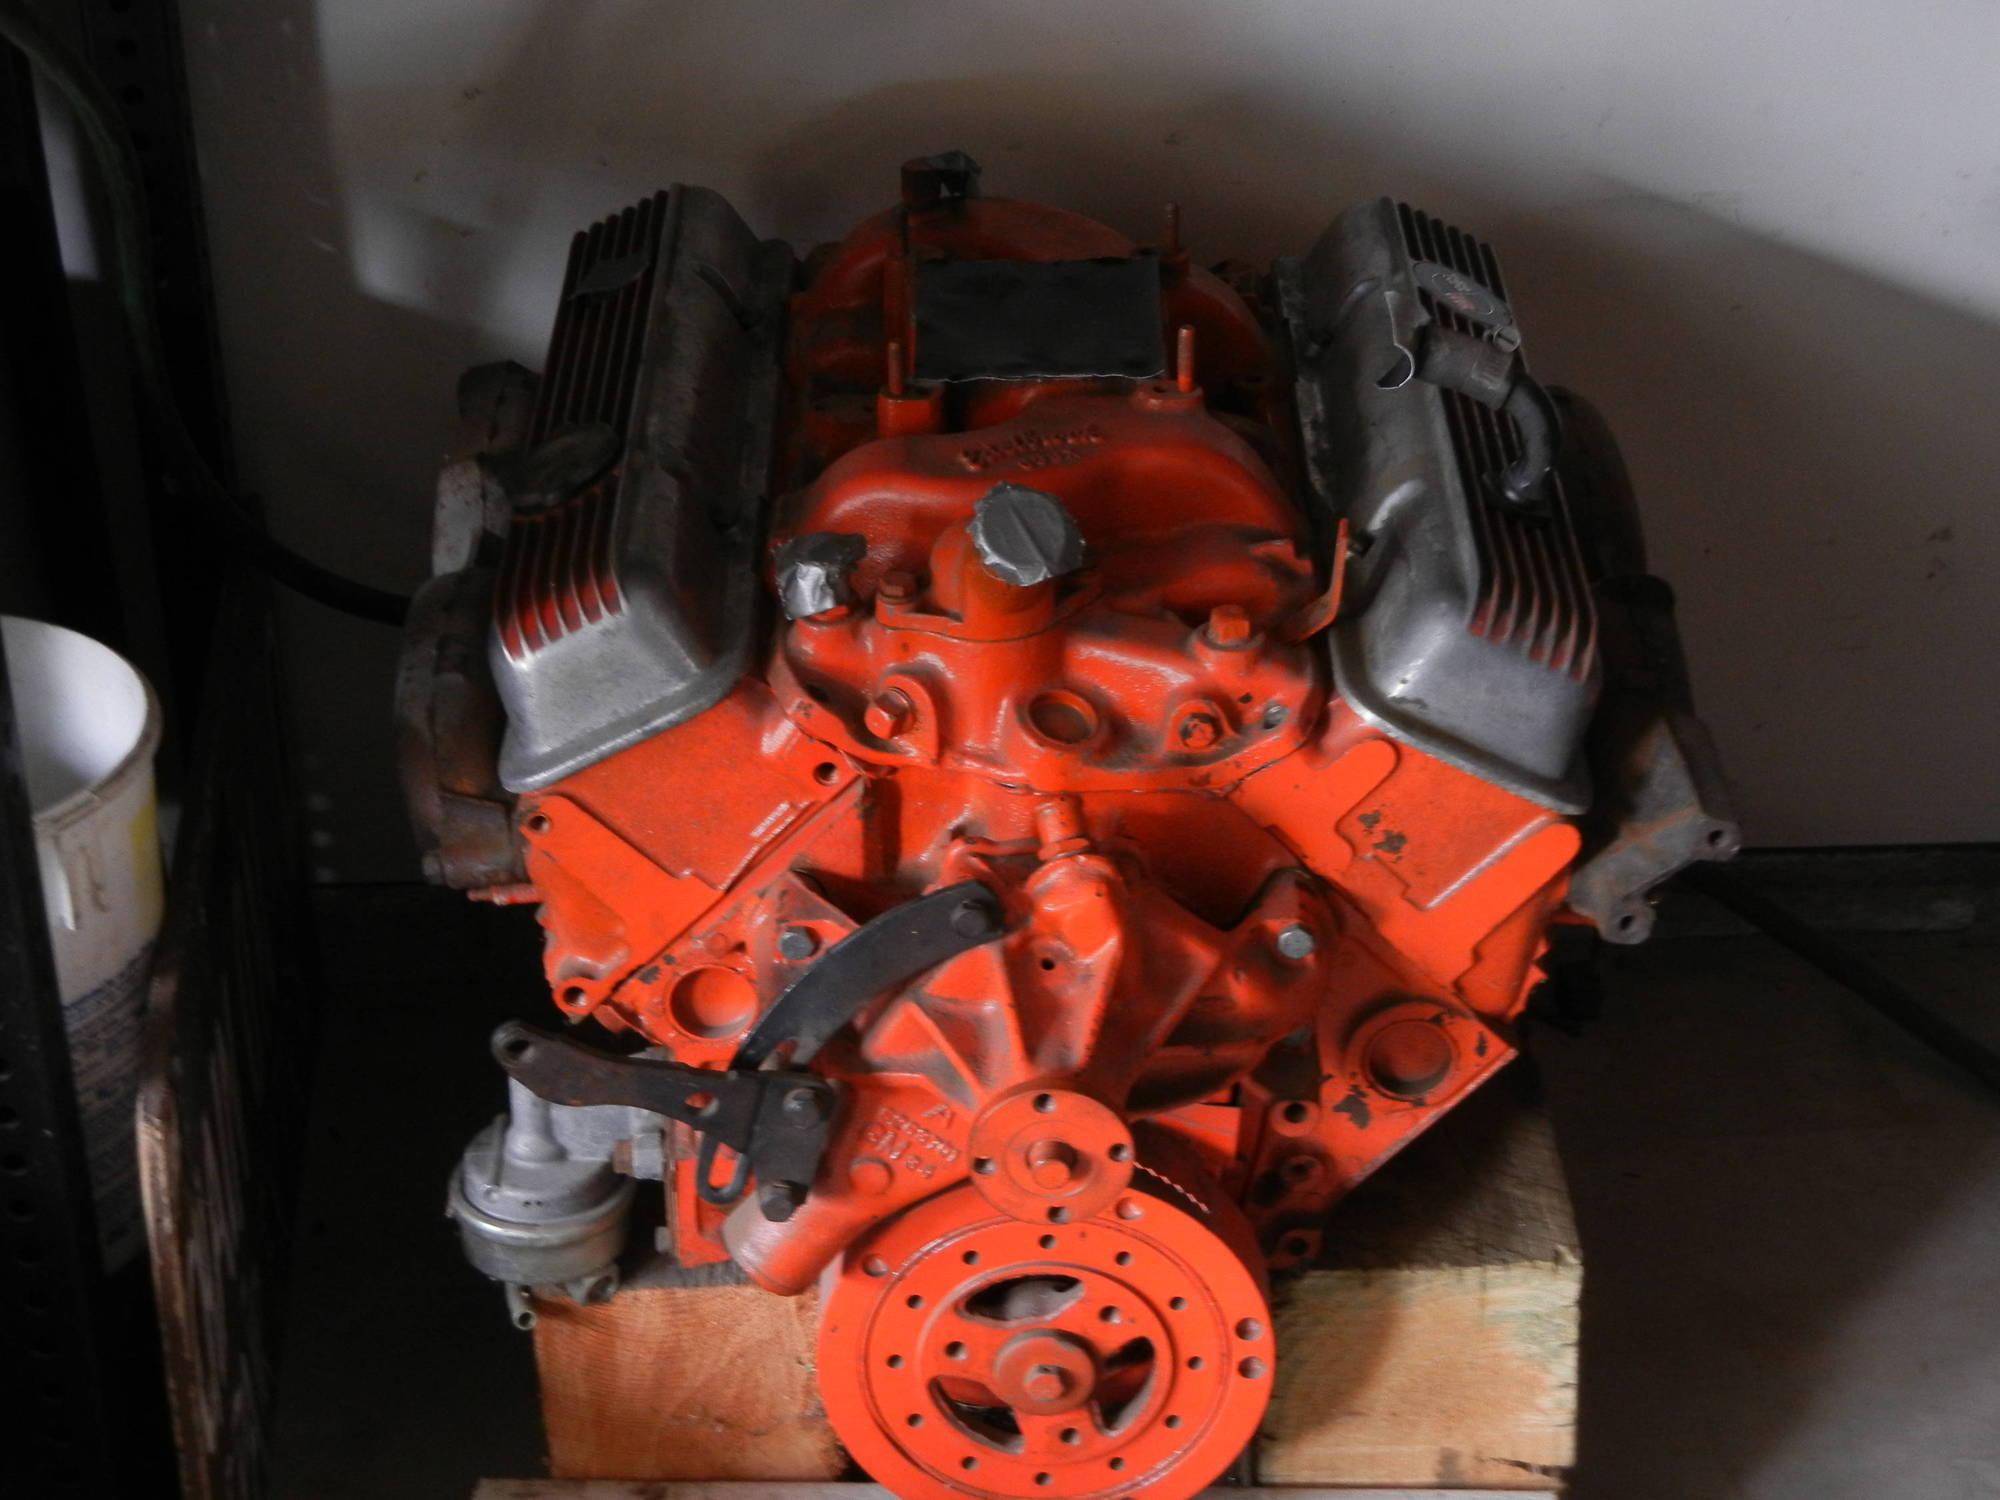 1971 engine for sale lt1 350 Camaro $1500 plus shipping